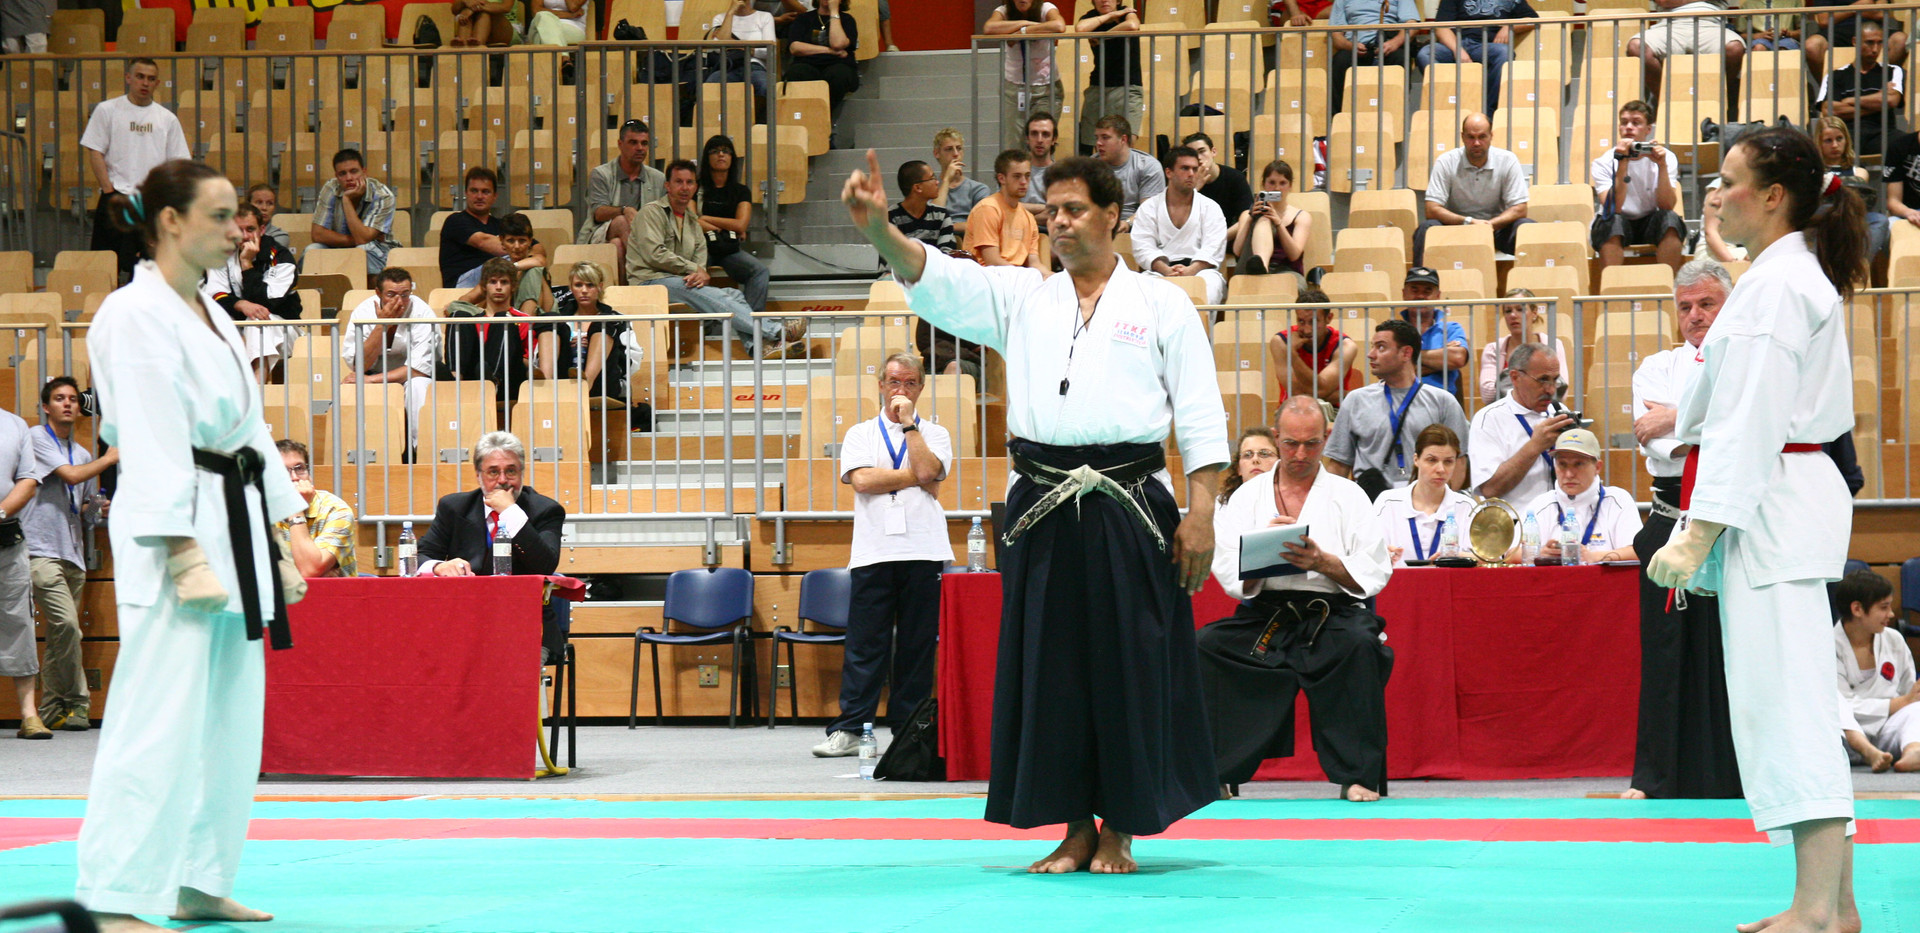 28 champ-d'europe mai 2007 187.jpg